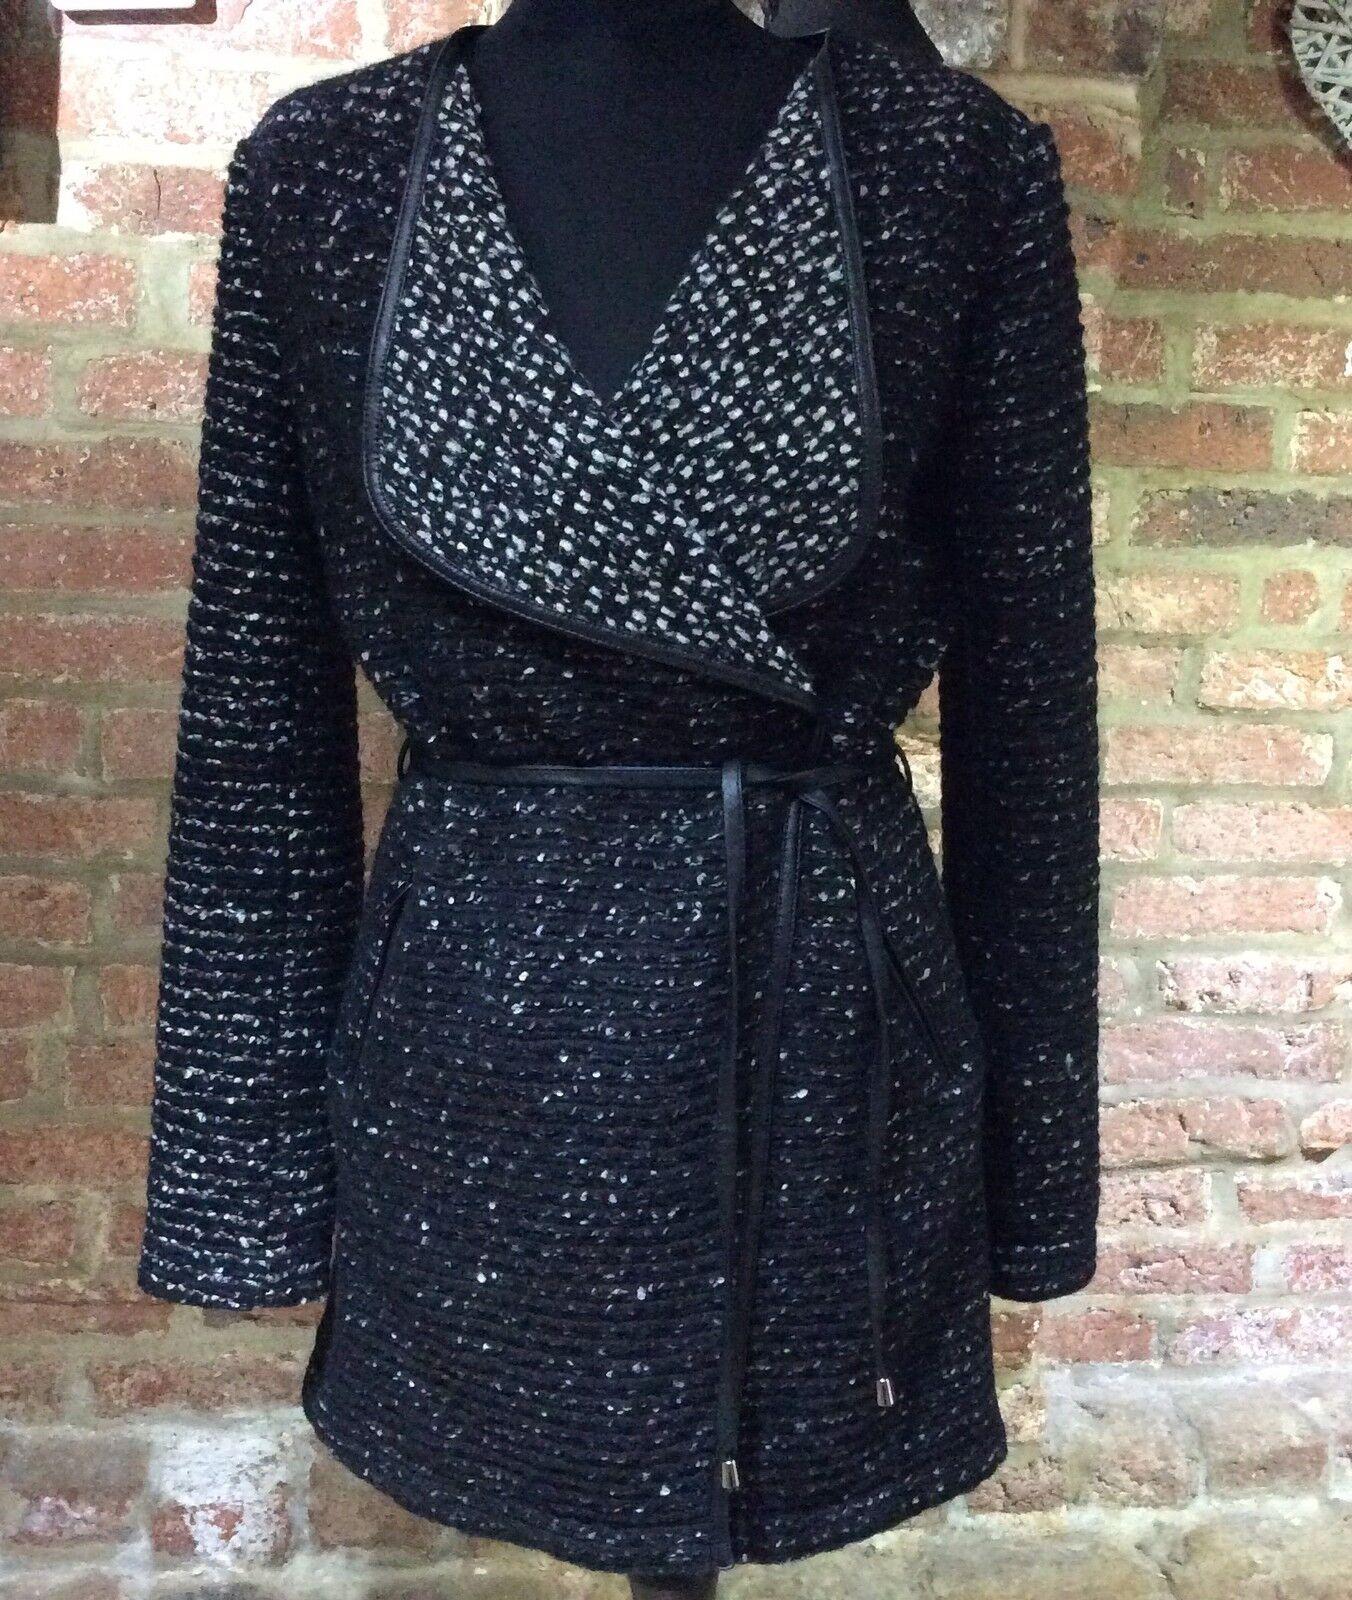 Oui Luxury Edition Leather Trim Coat - Cardigan UK10 (12 14) -BNWT RRP .00